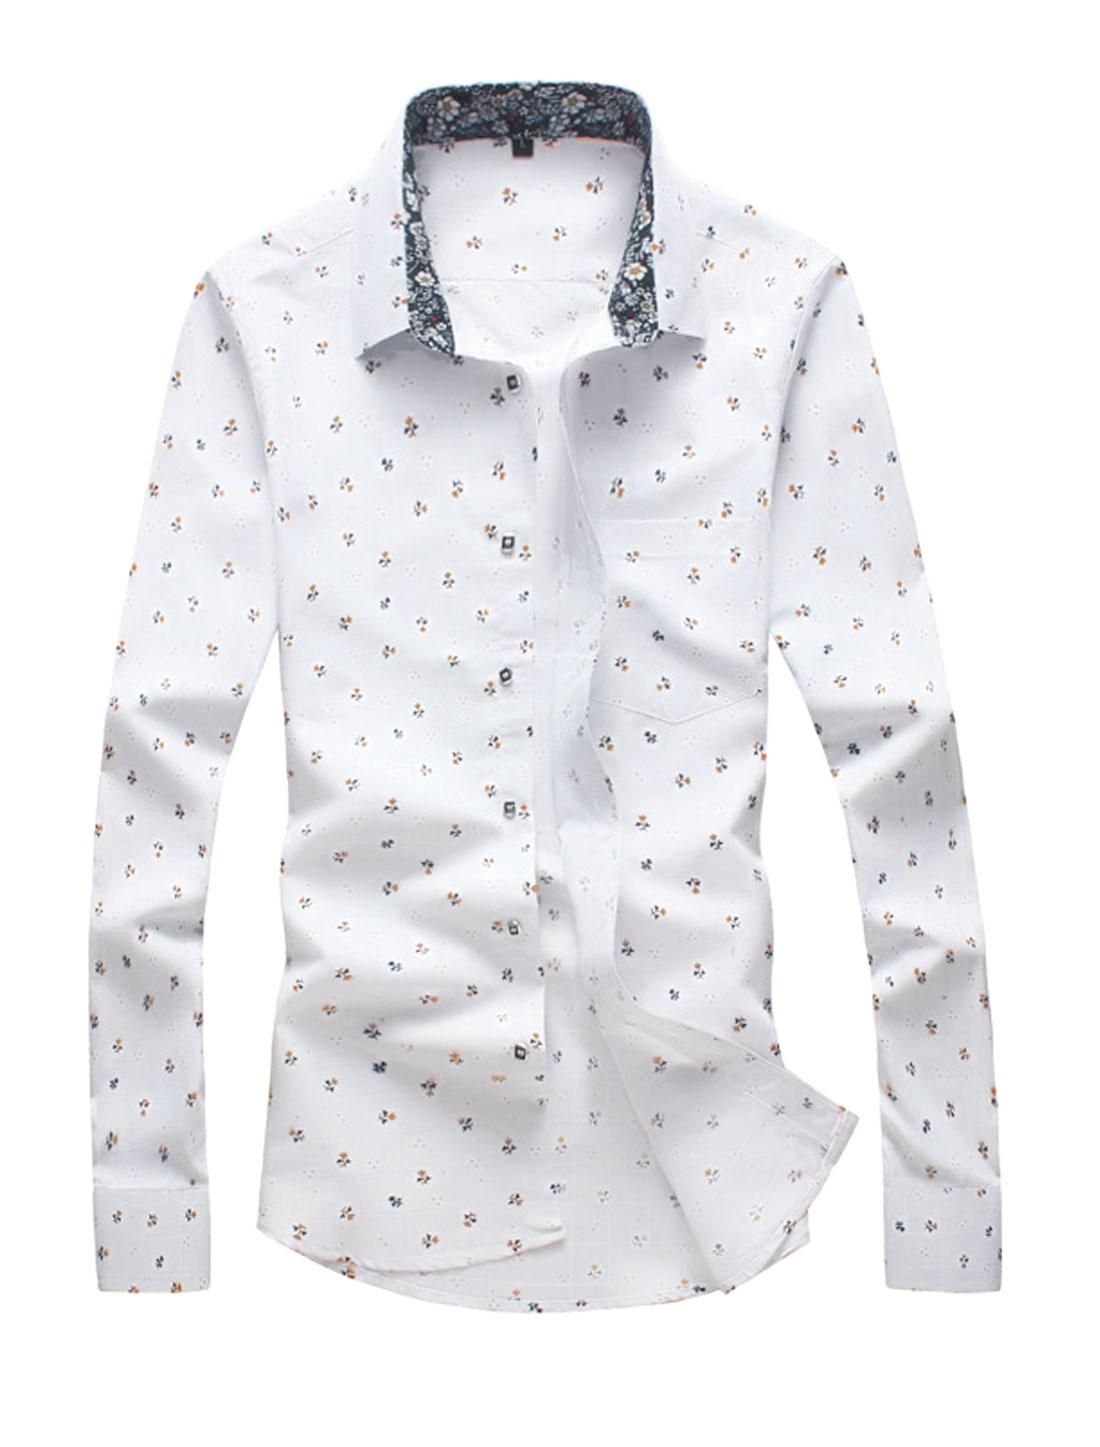 Men Point Collar Slim Fit One Pocket Floral Shirt White M